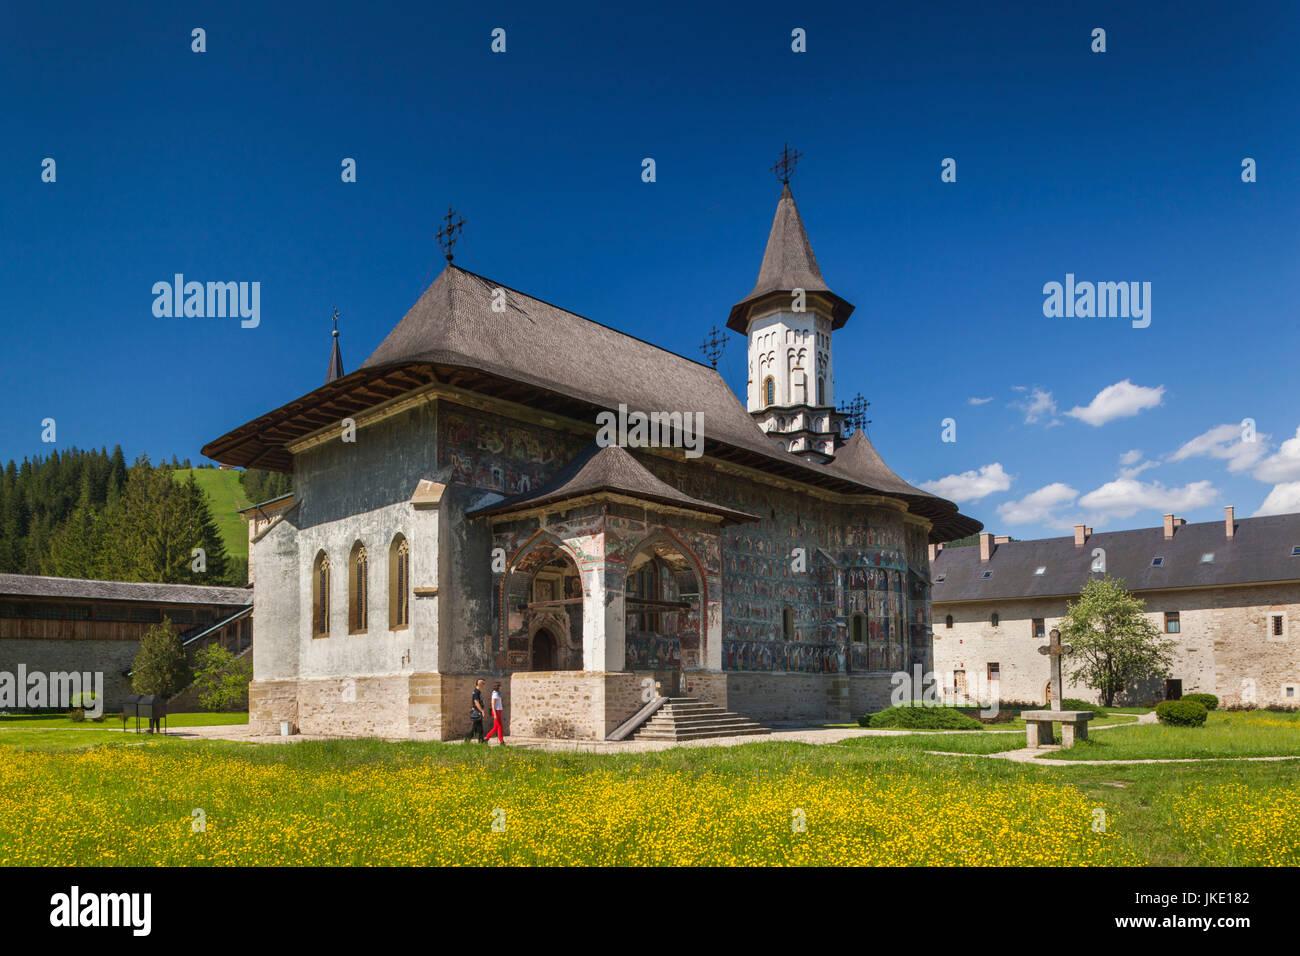 Romania, Bucovina Region, Bucovina Monasteries, Sucevita, Sucevita Monastery, 16th century, exterior - Stock Image